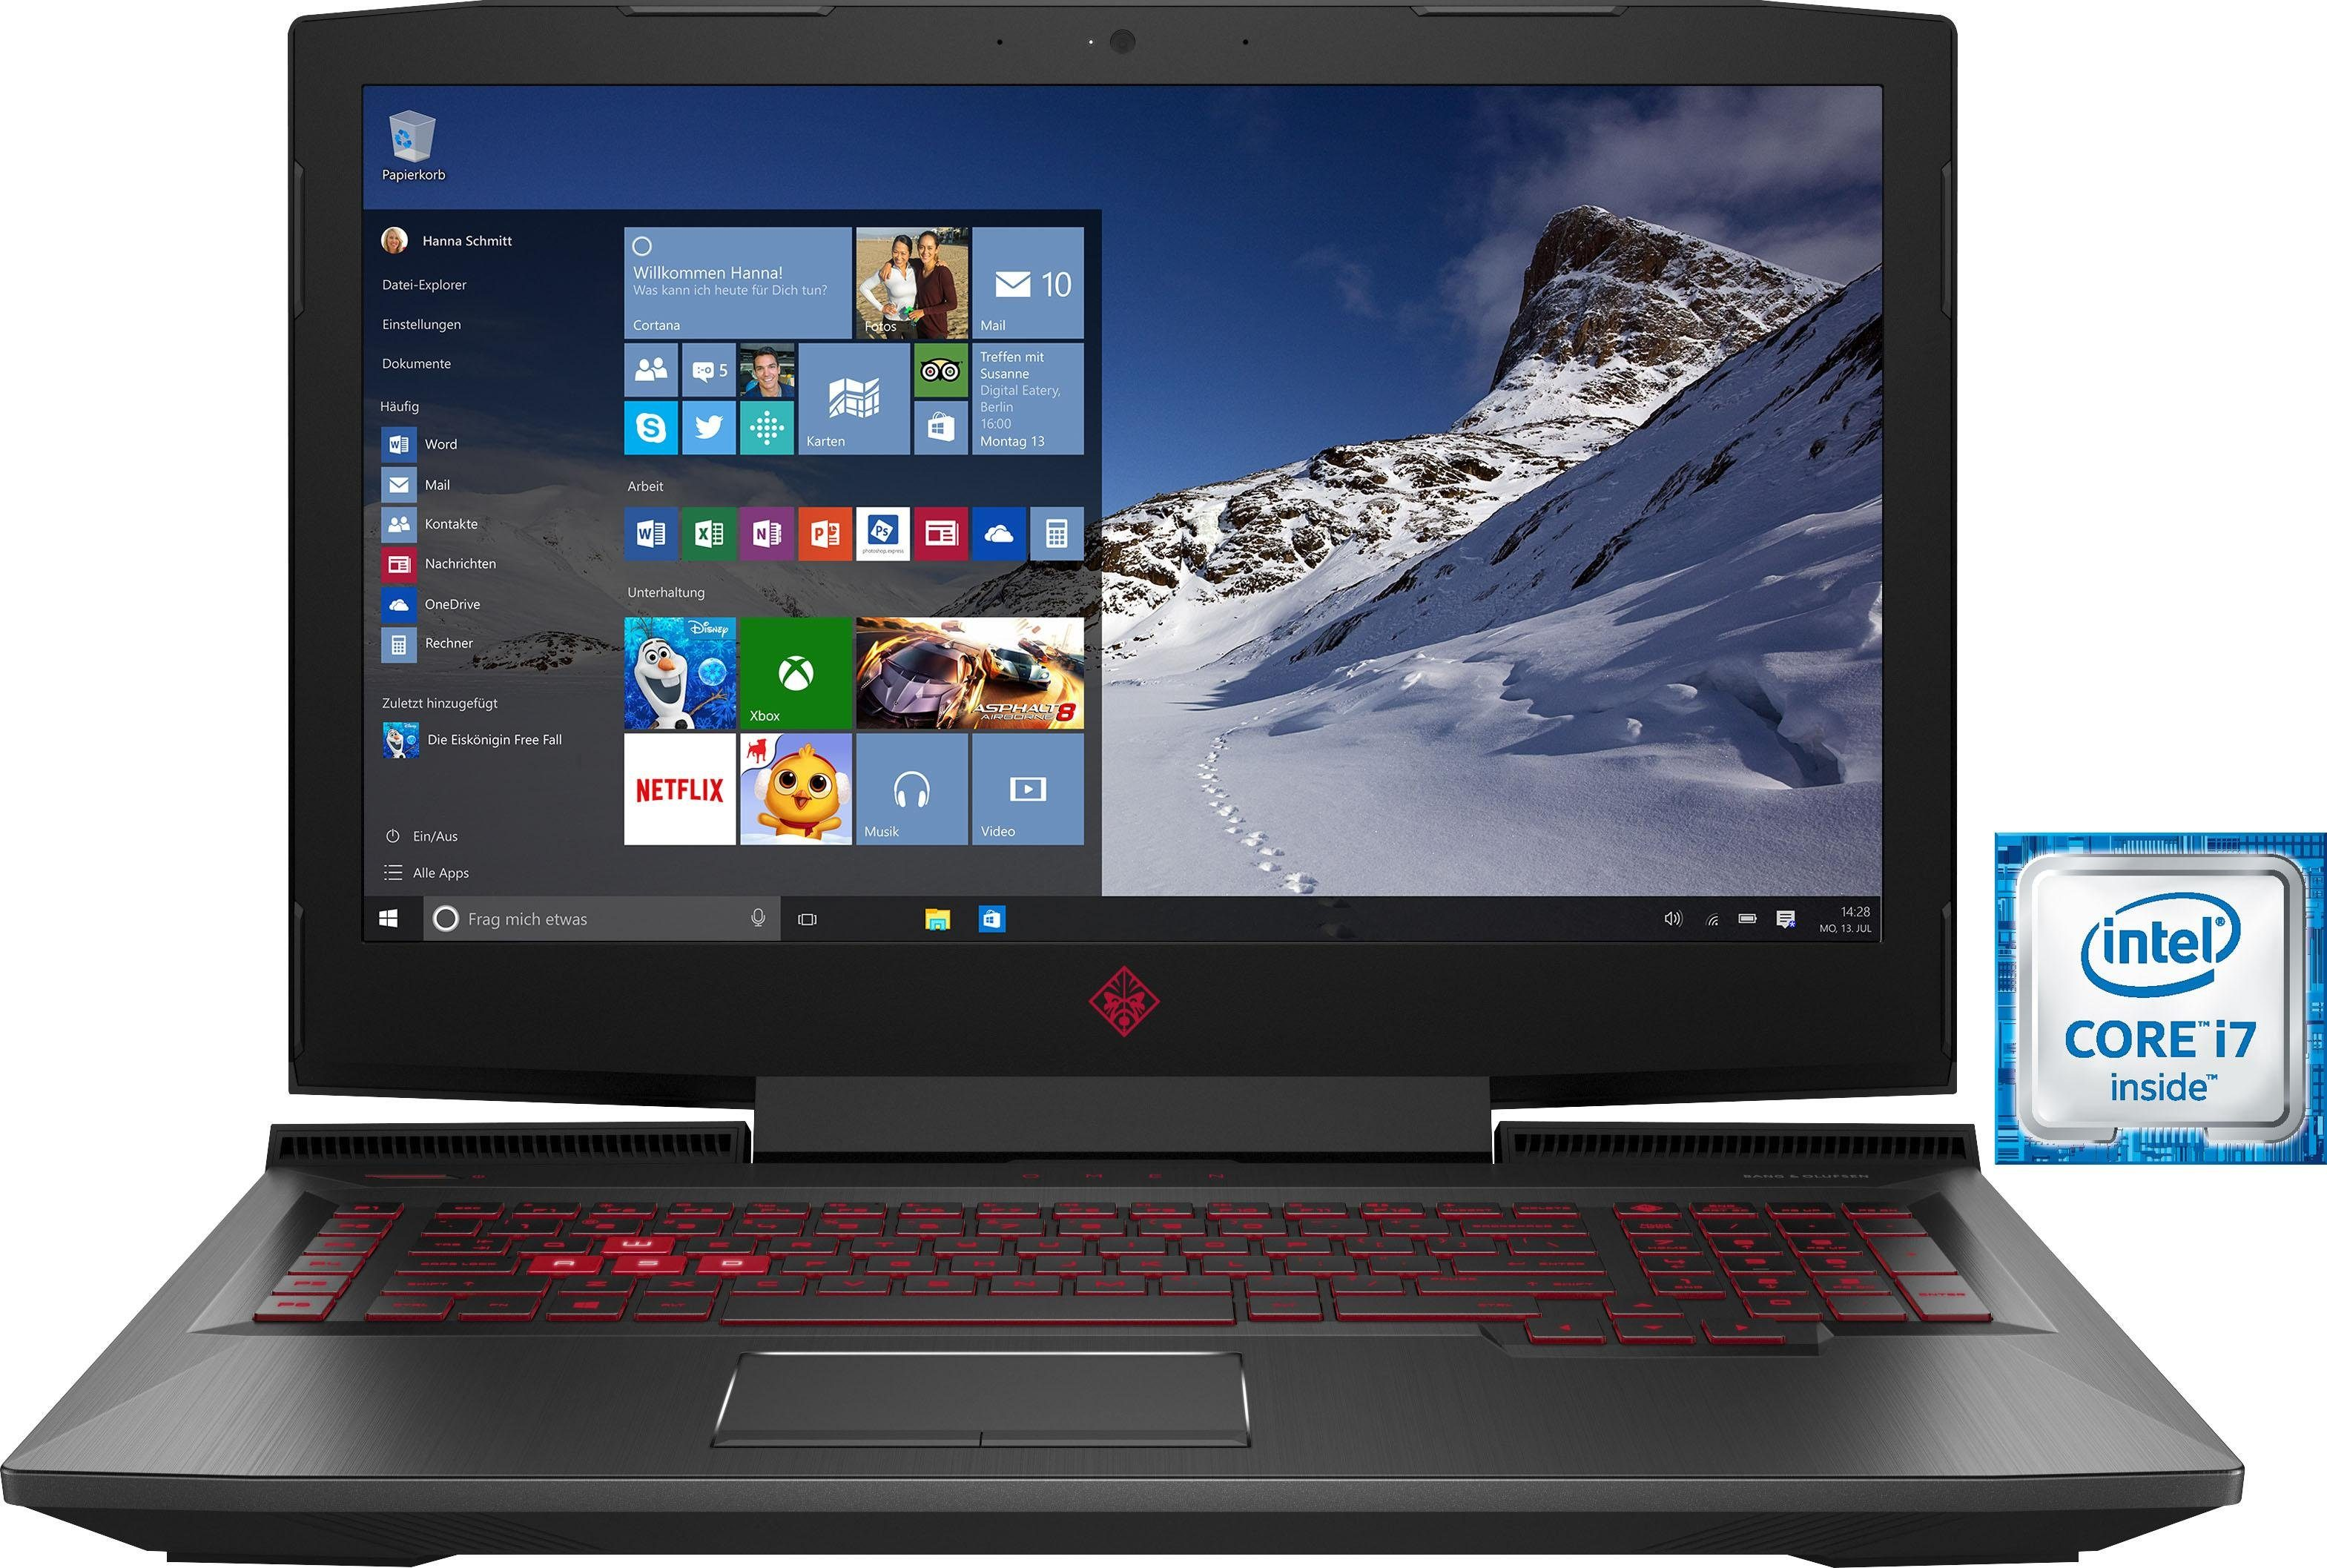 OMEN by HP 17-an013ng Gaming Notebook (43,9 cm/17,3 Zoll, 120 Hz, Intel Core i7, GTX 1060, 1000 GB HDD, 256 GB SSD)